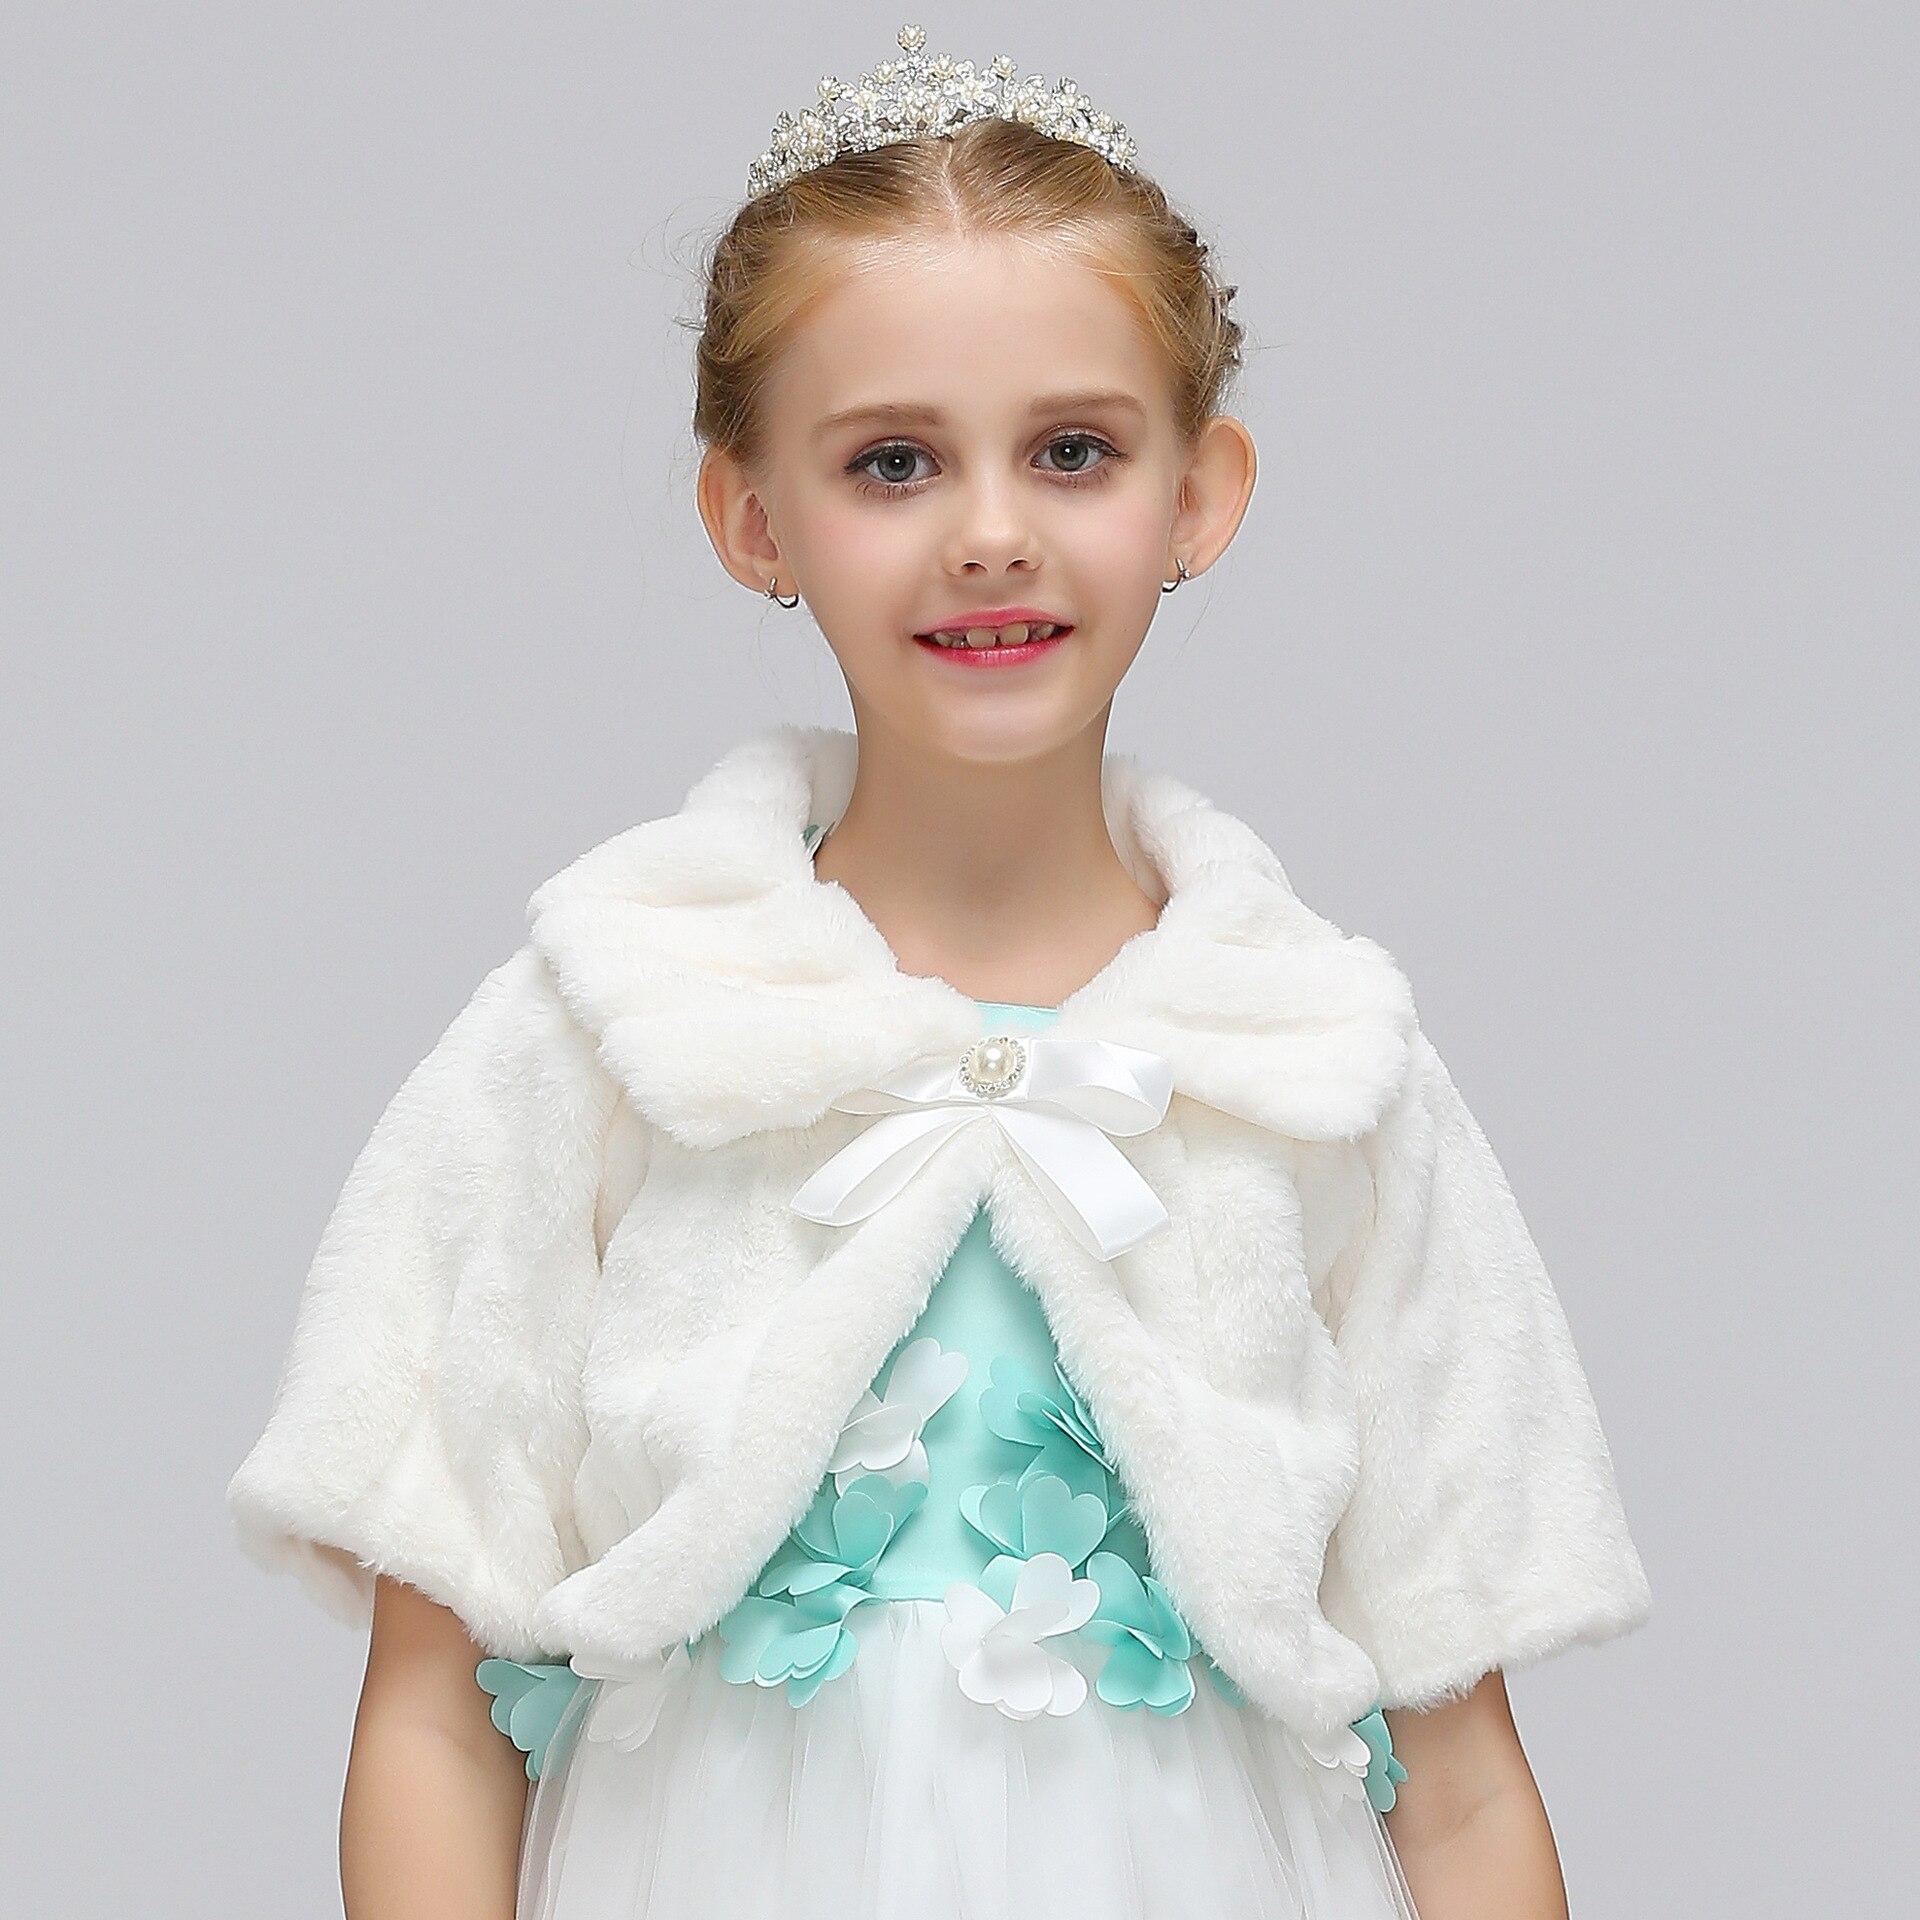 Warm Fur Shawl For Kids Party Prom Faux Fur Wrap Bolero Kid Ivory Cameo Champagne Blue 4 Colors Wedding Girl Bolero Jacket Cape